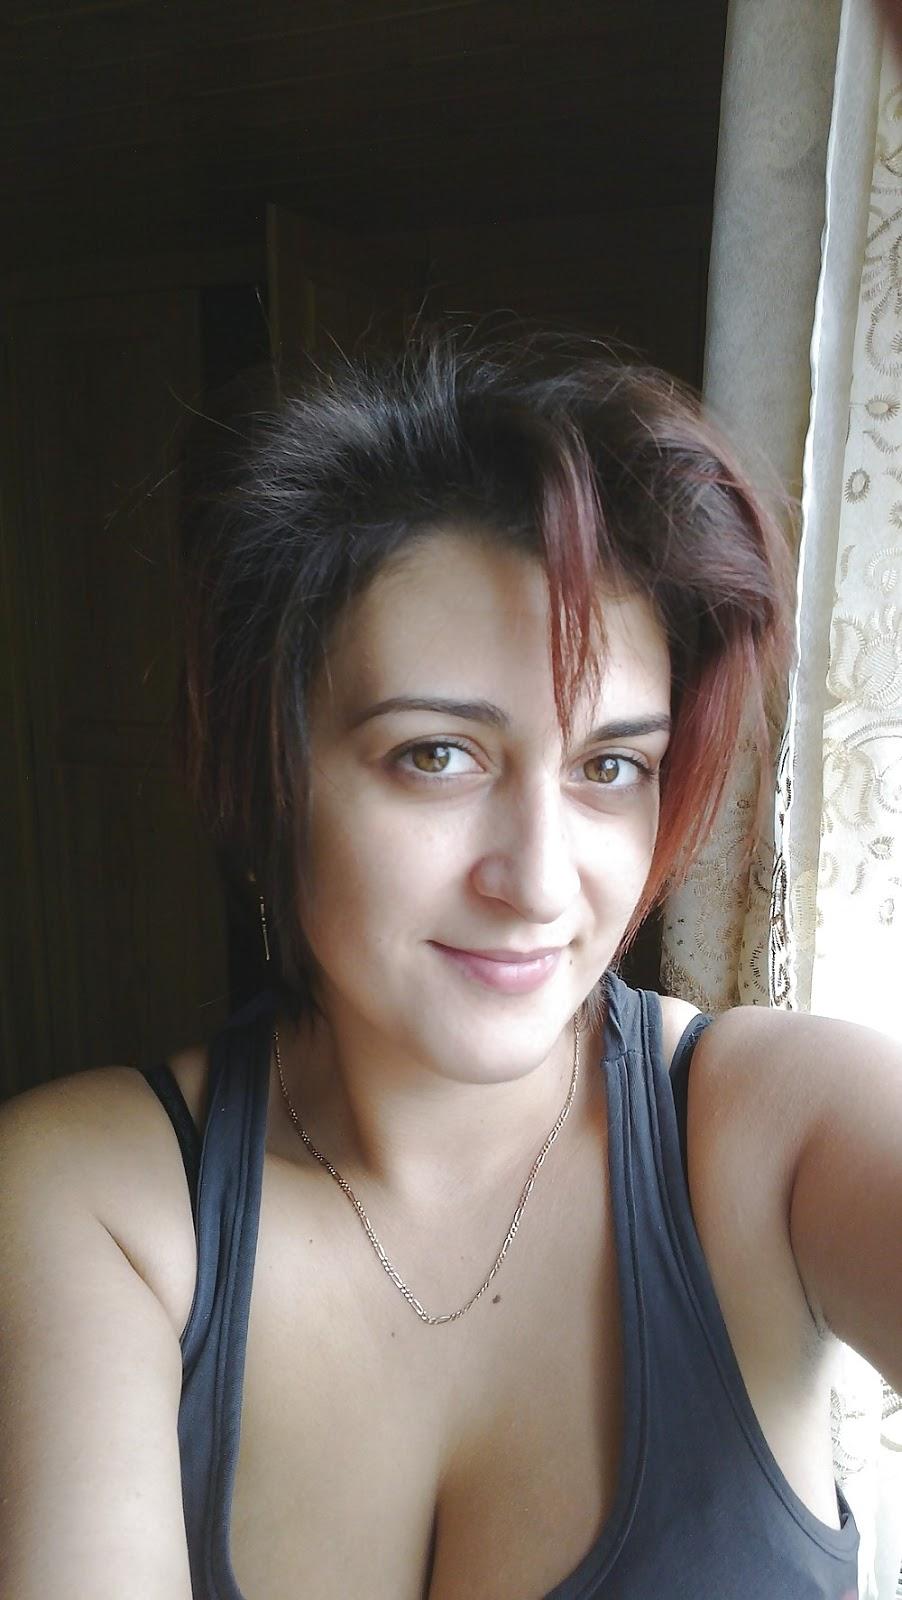 Hot Pakistani Stories, Hot Pakistani Women: December 2012